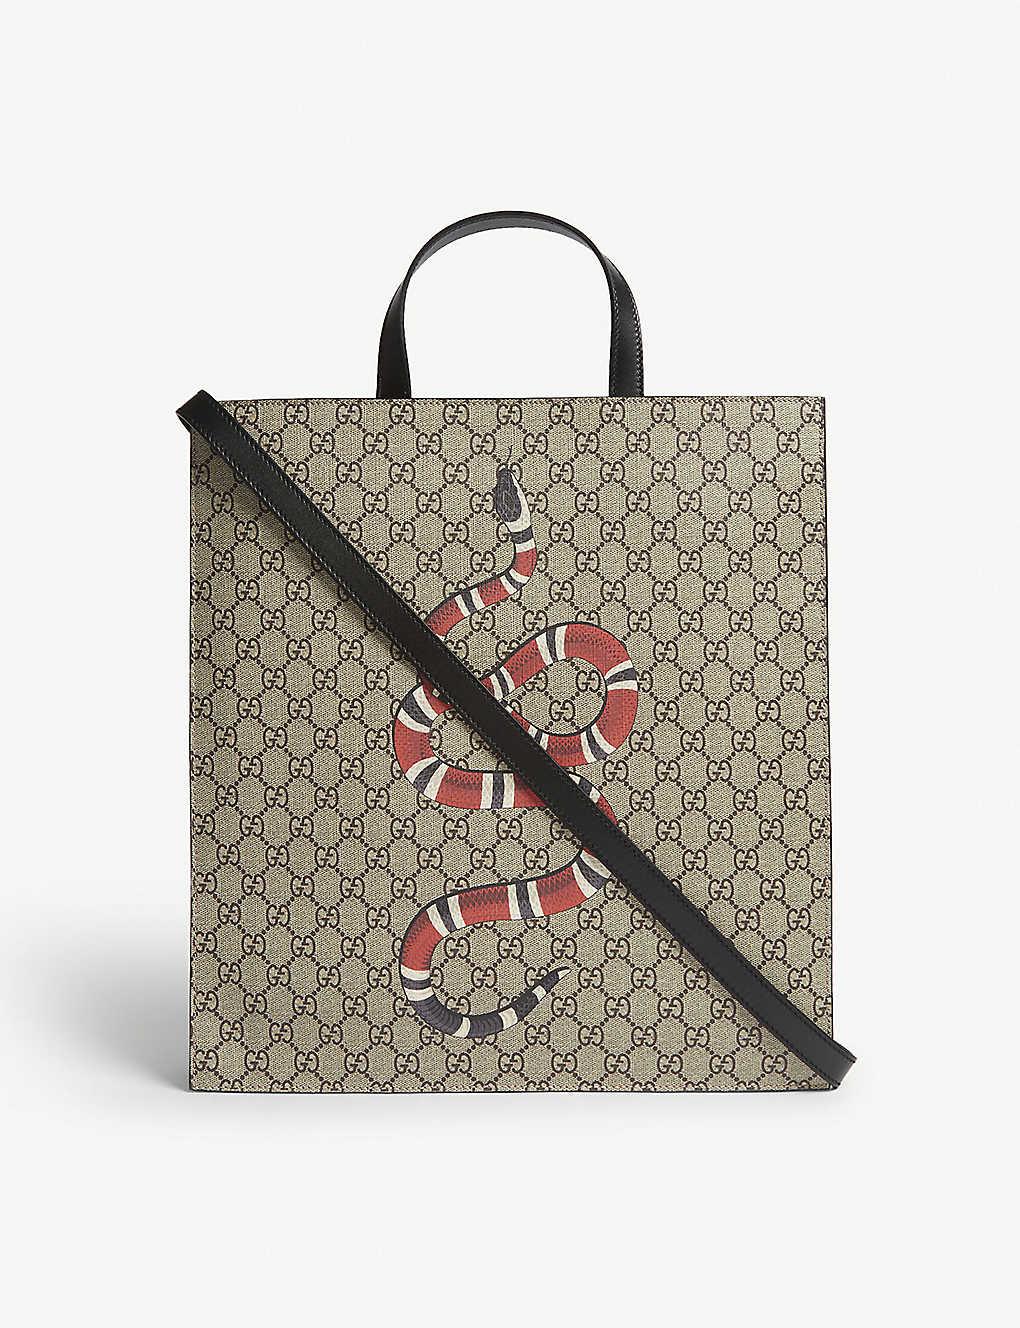 b0d5d7242bbb6b GUCCI - Kingsnake soft GG supreme tote bag | Selfridges.com